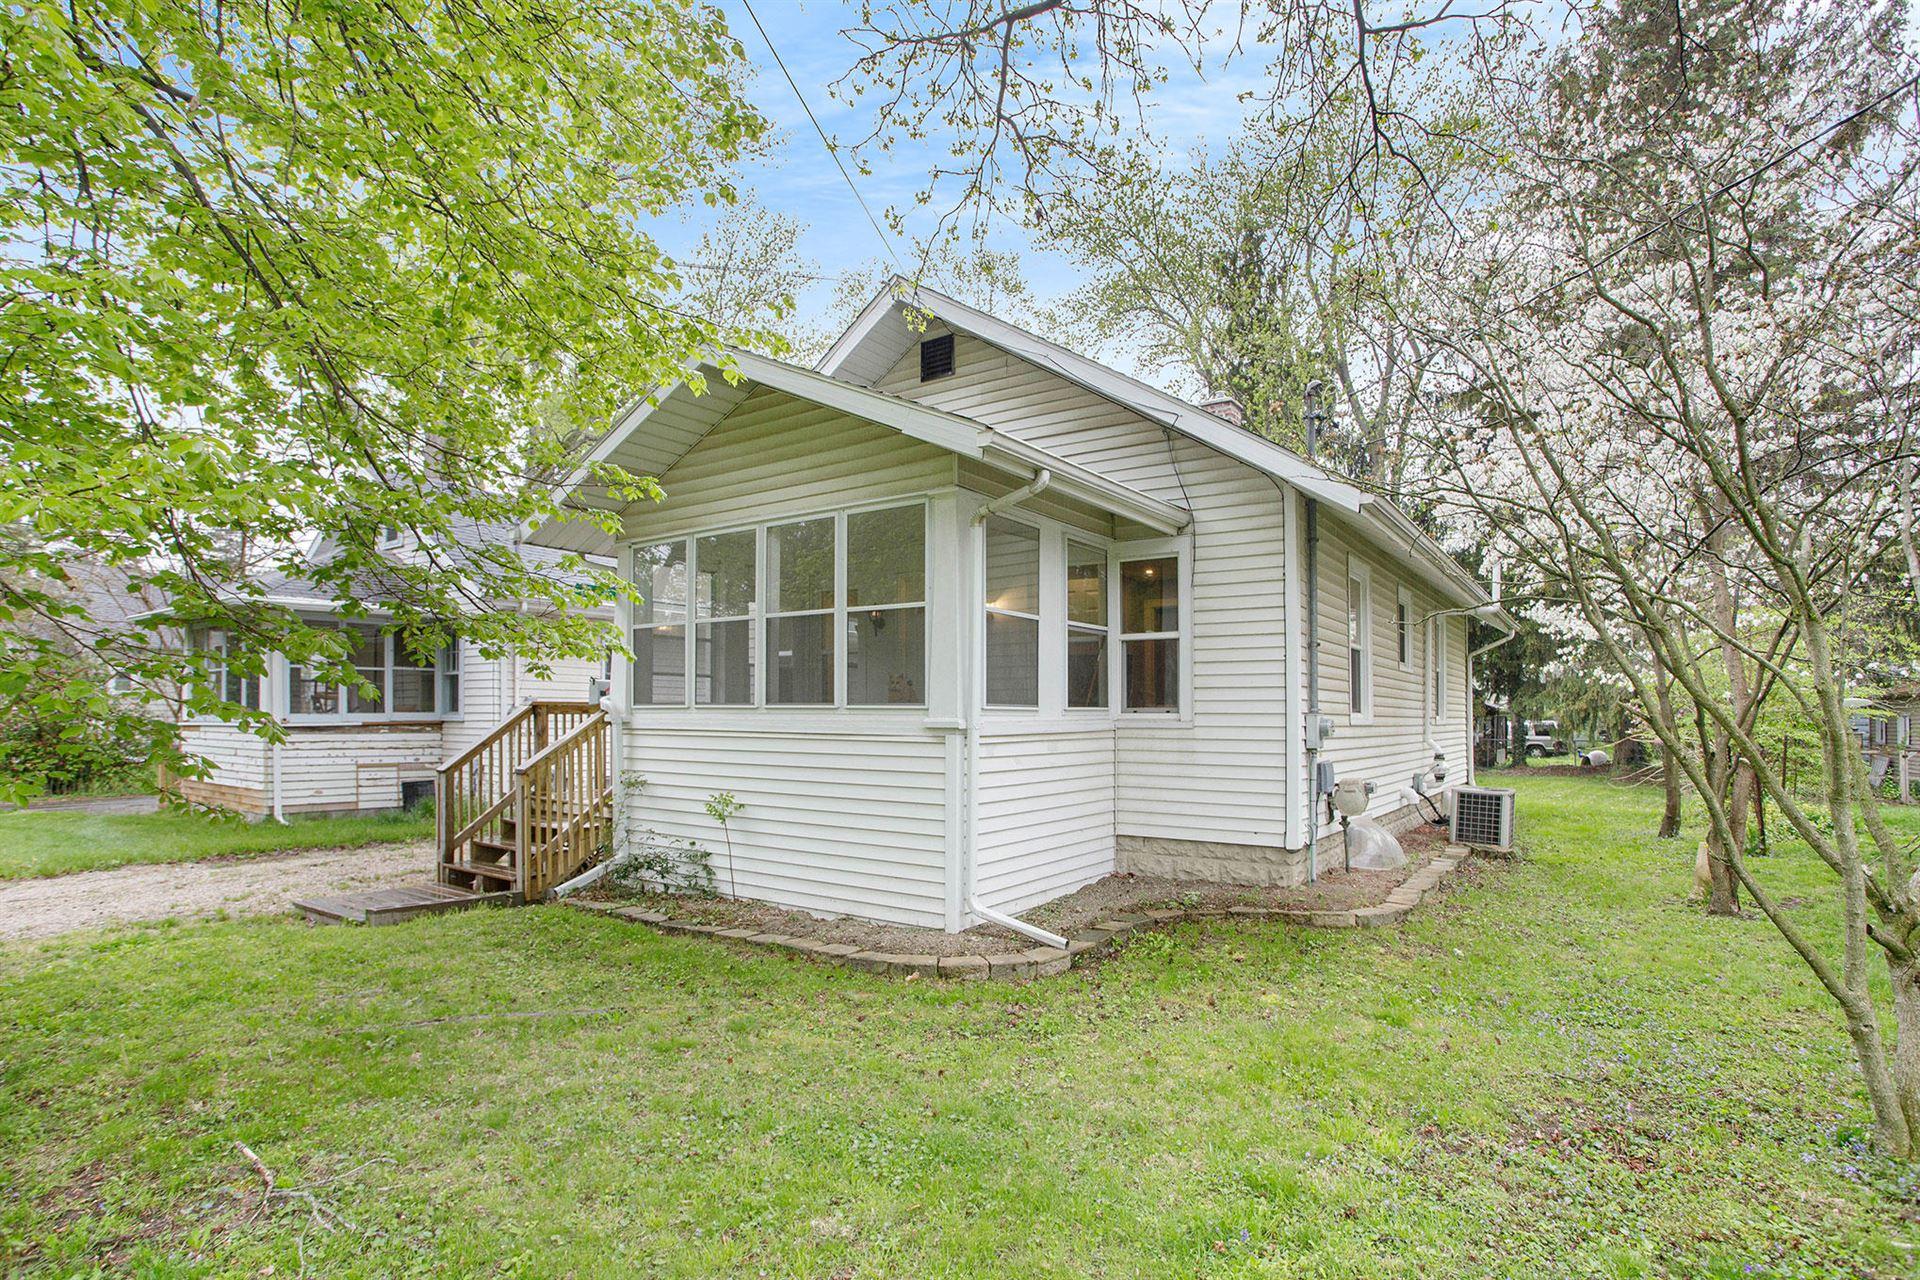 1517 Sunnyside Drive, Kalamazoo, MI 49048 - MLS#: 21016858